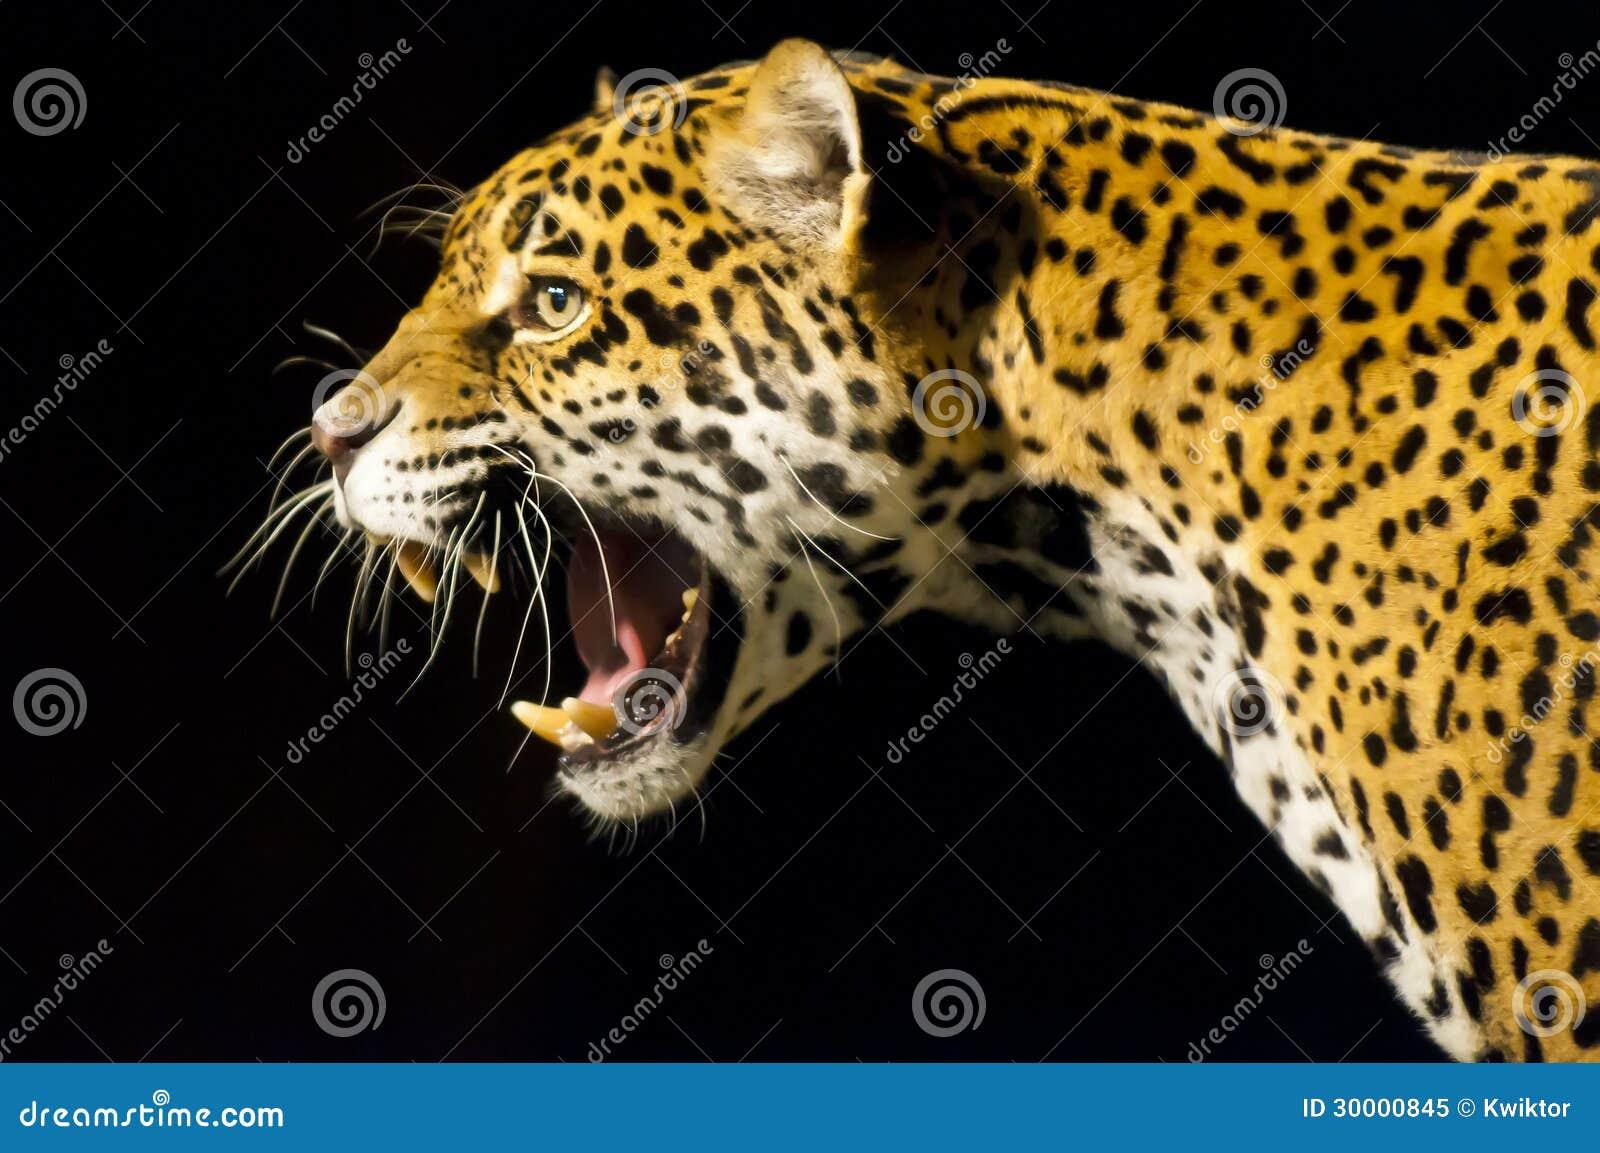 Roaring Jaguar Royalty Free Stock Photo Image 30000845